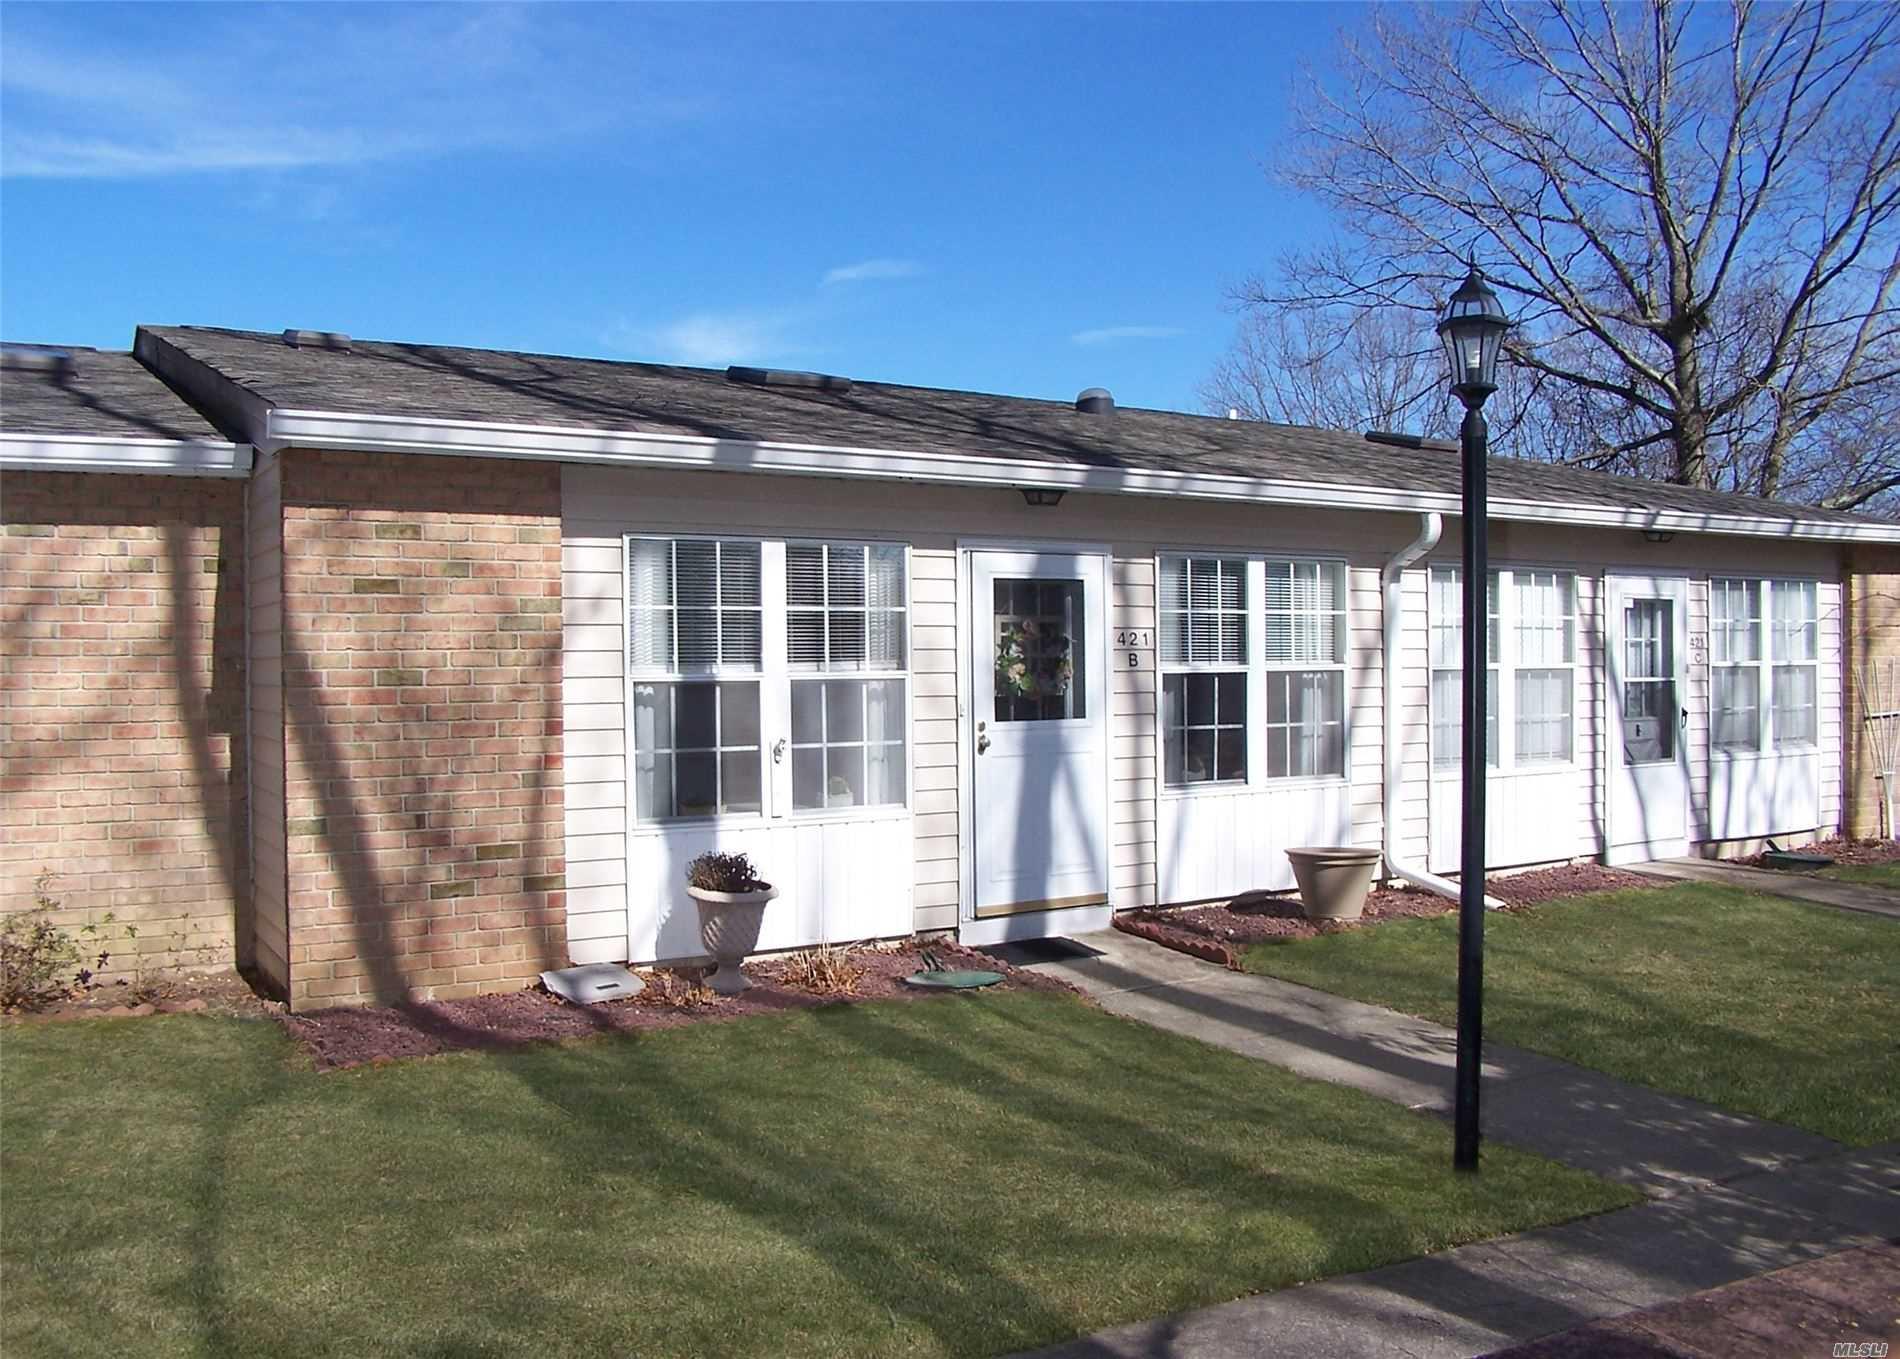 Property for sale at 421 Weymouth Court # B, Ridge NY 11961, Ridge,  New York 11961